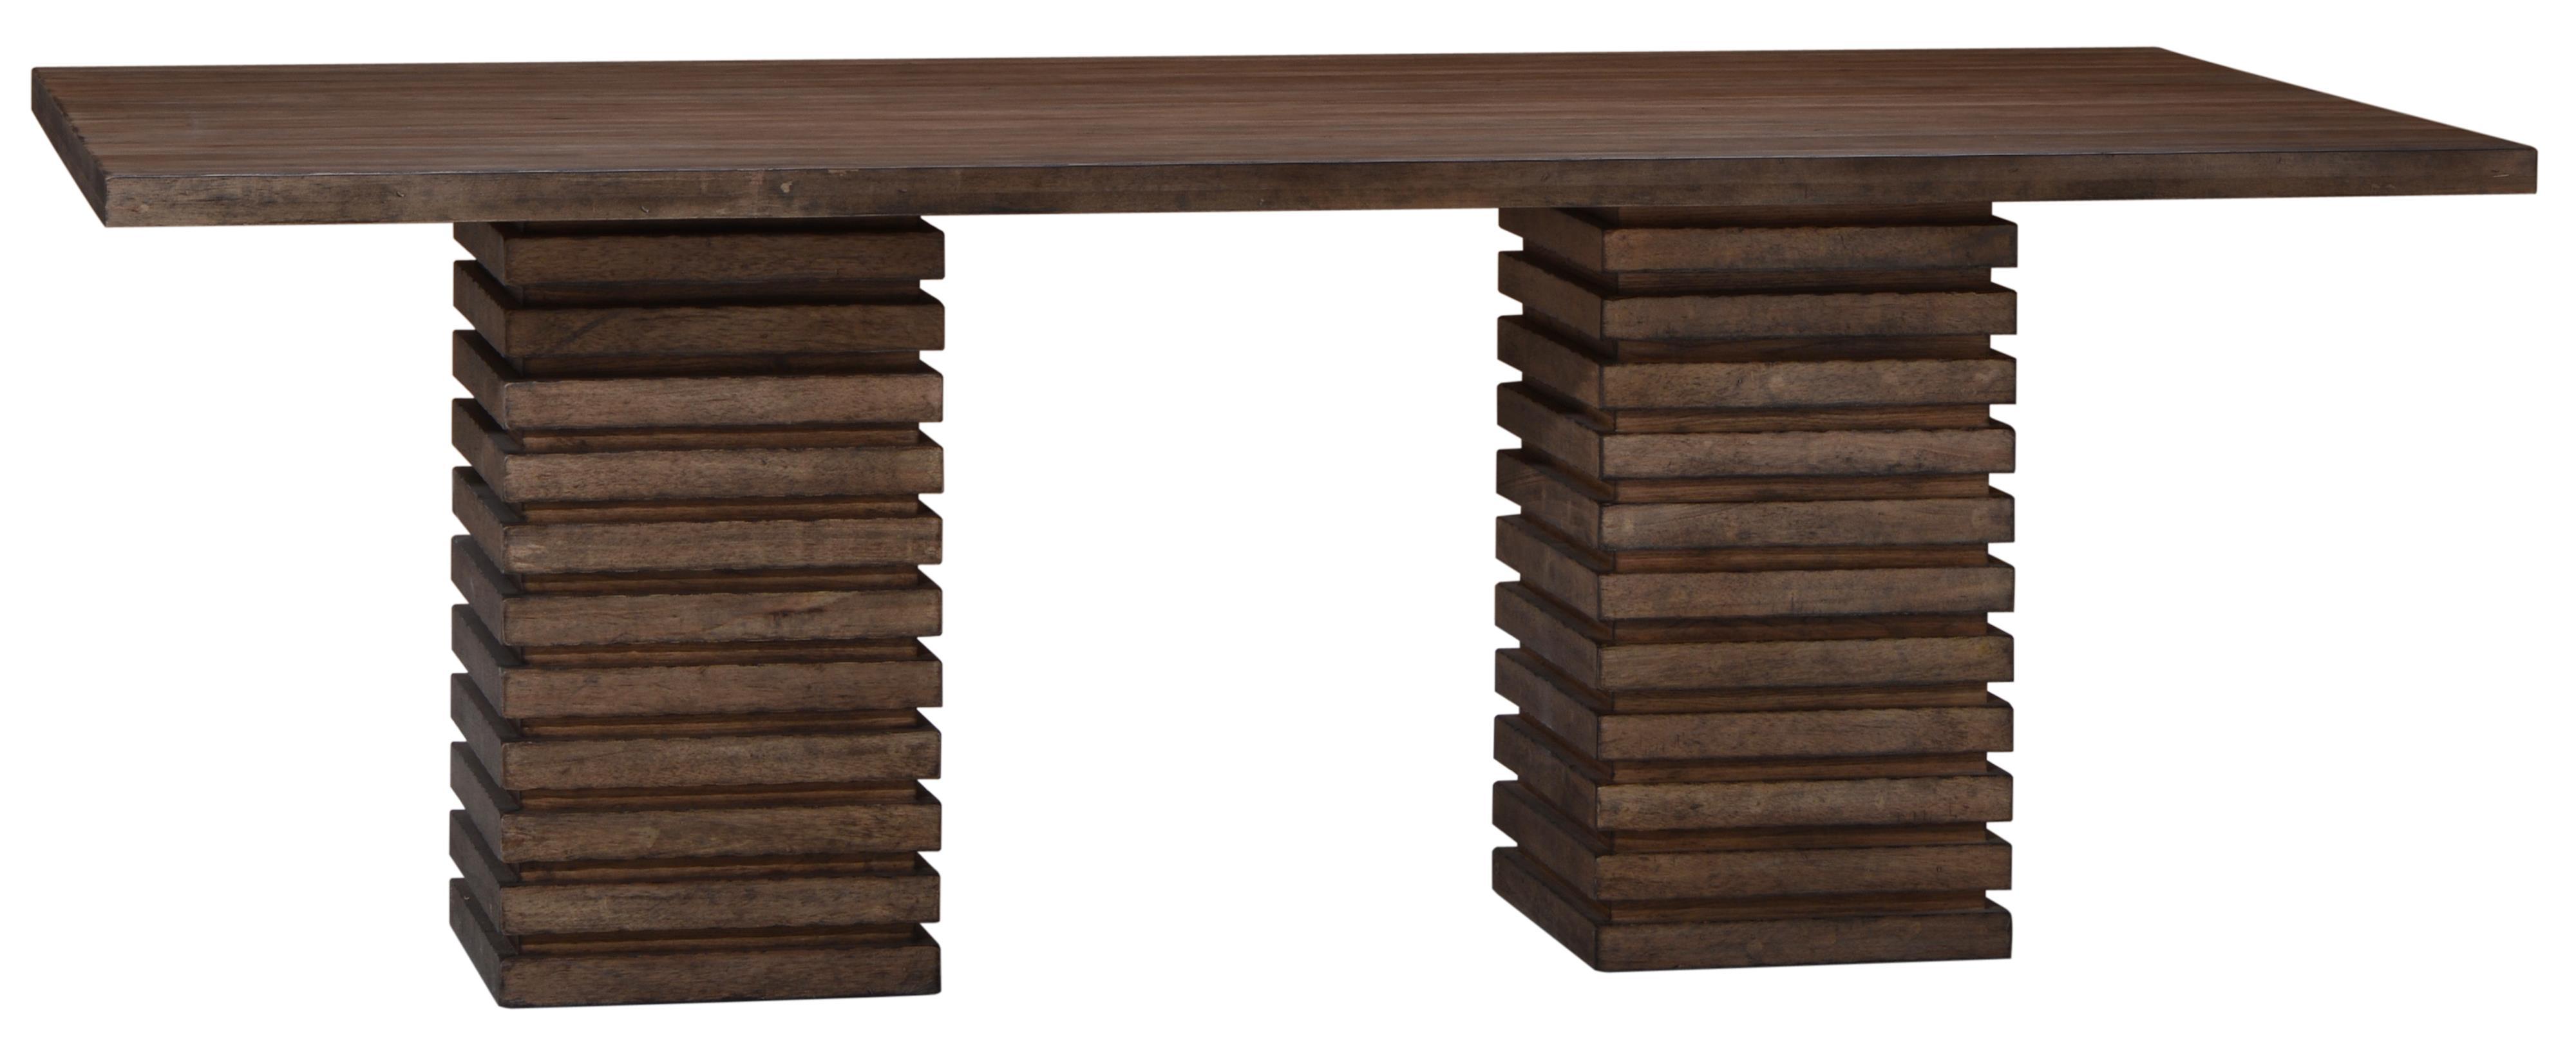 Belfort Signature Urban Treasures Shaw Double Pedestal Dining Table - Item Number: 223221-2302